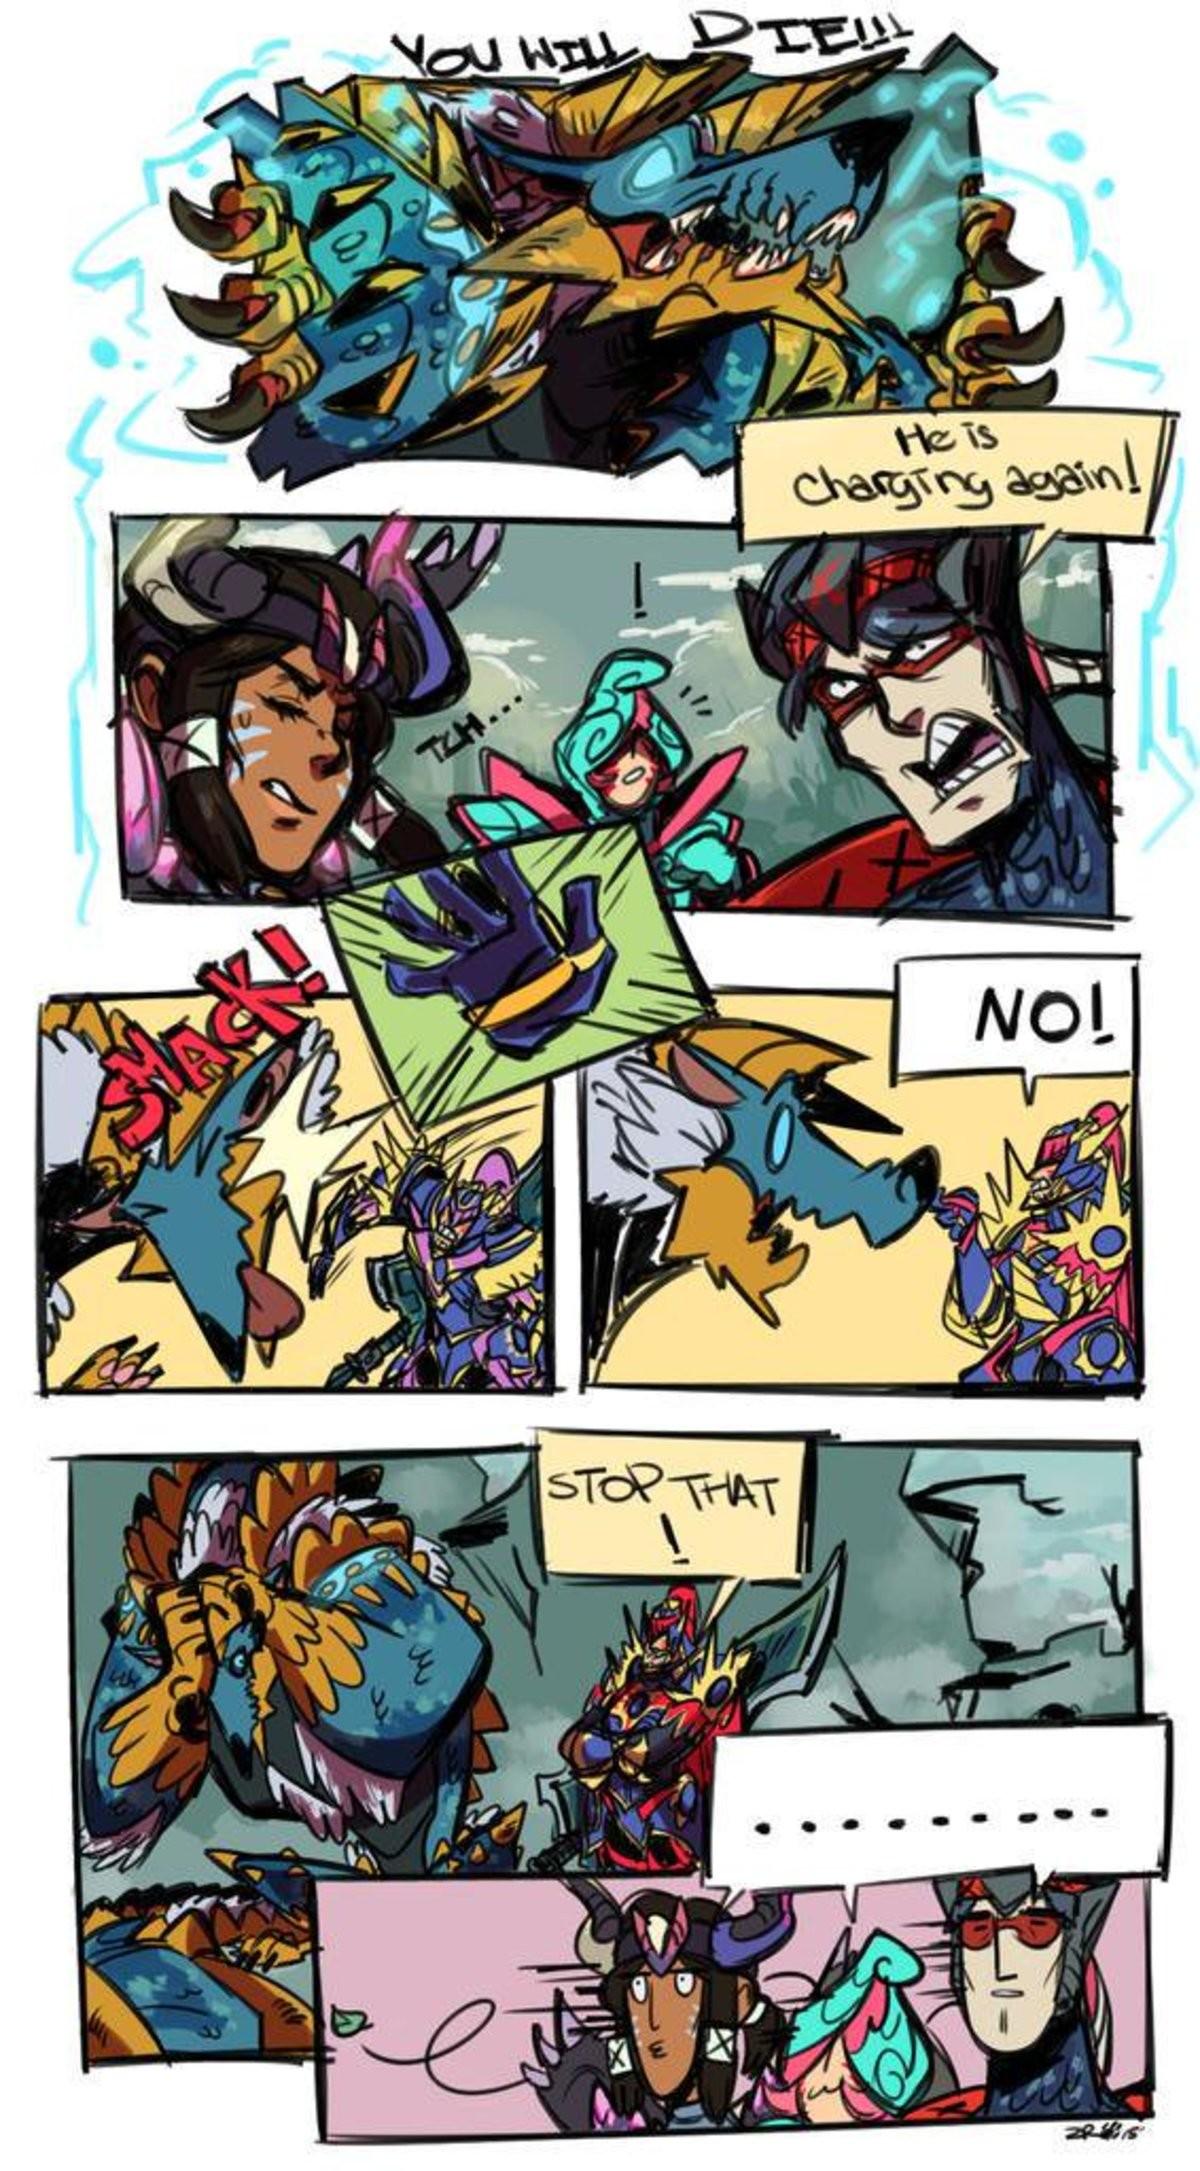 Bad monster, no. .